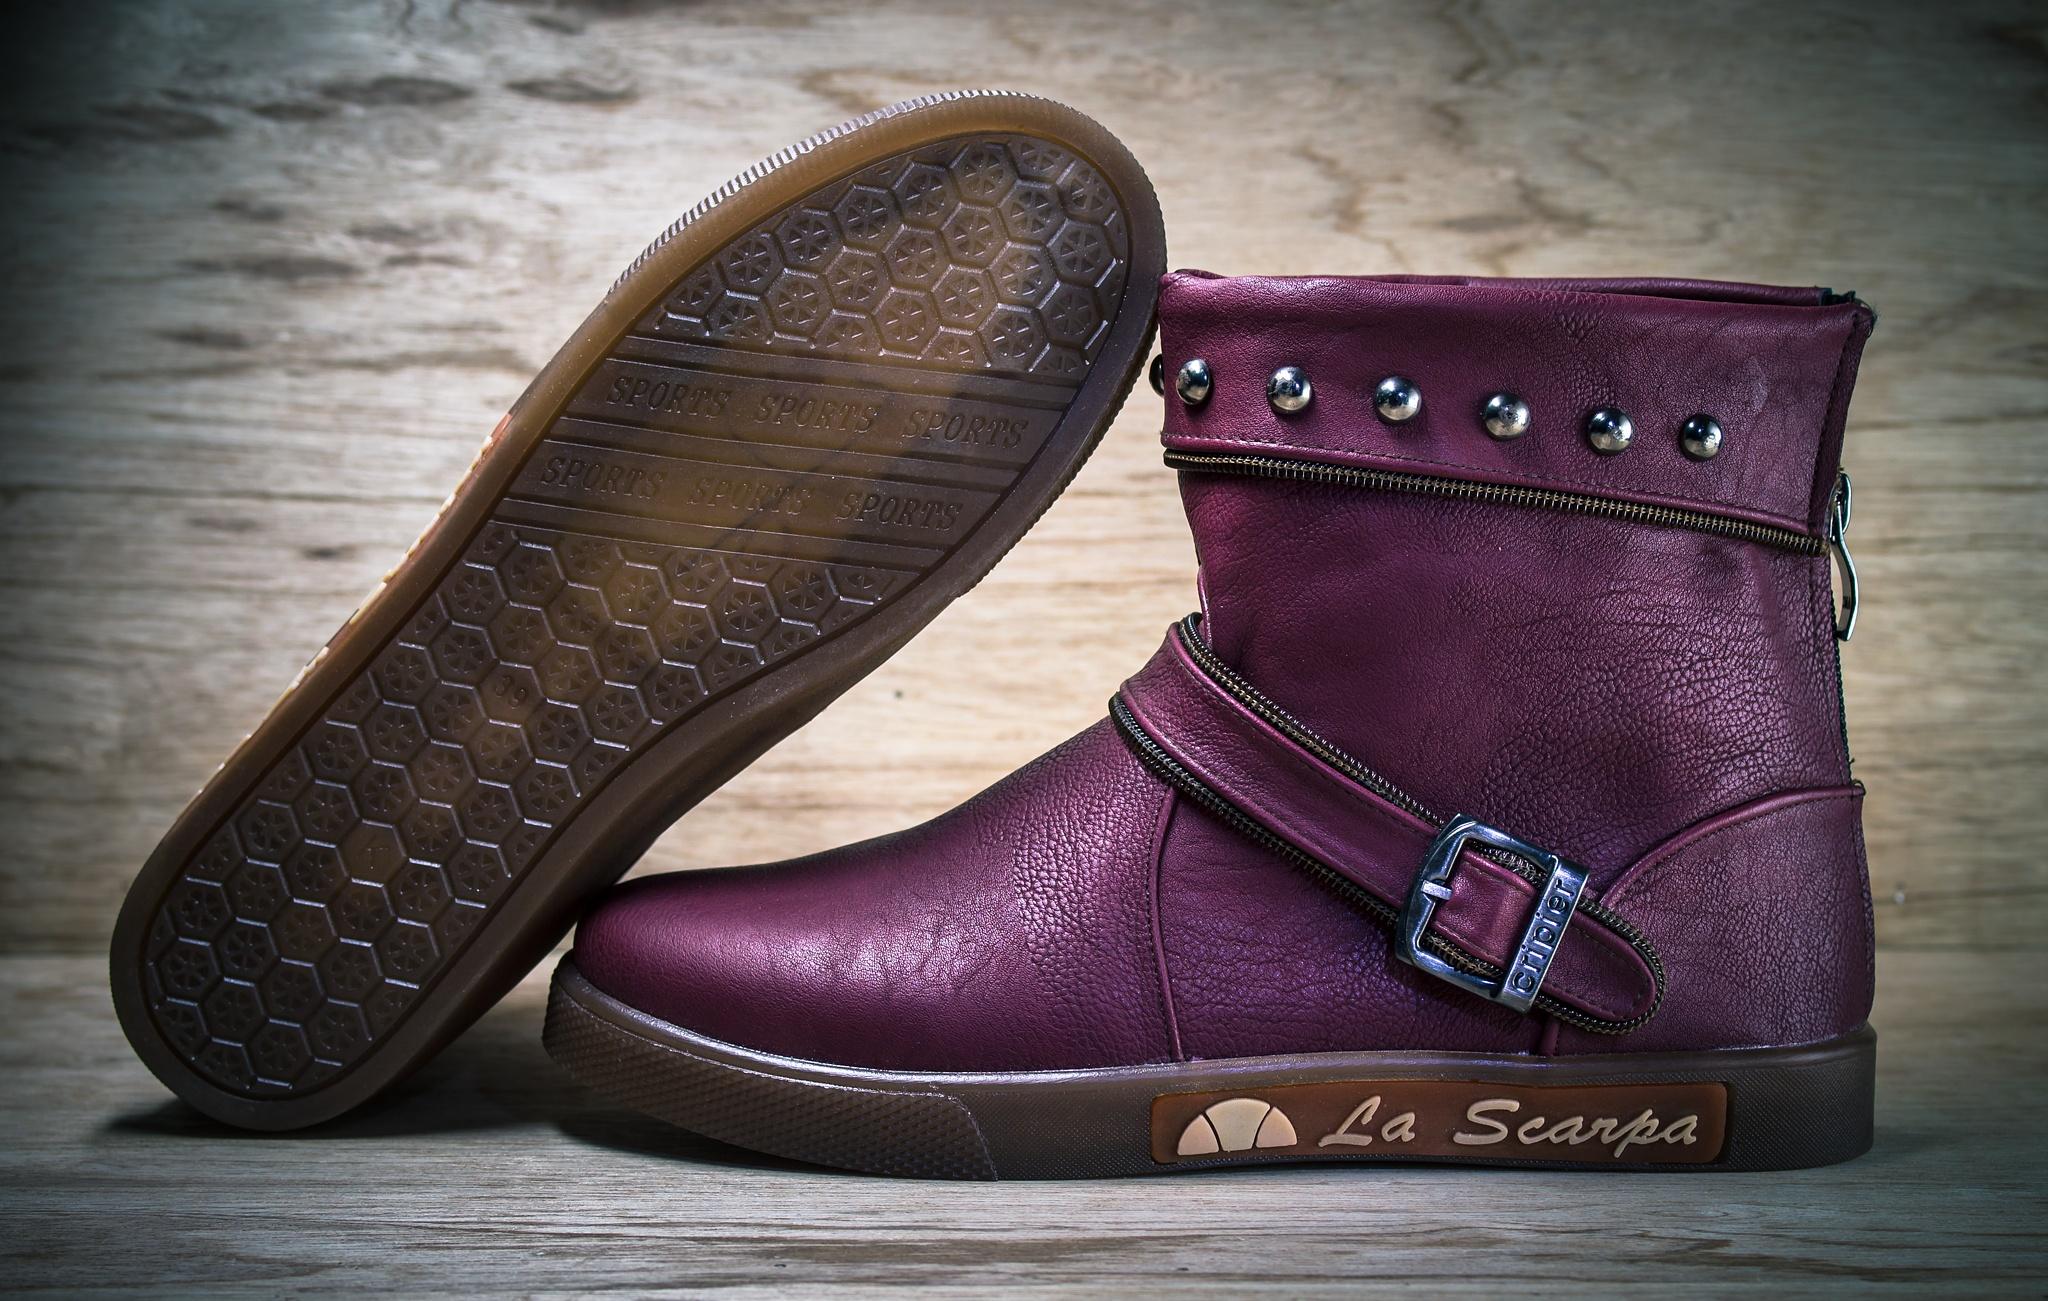 Shoes 2 set 2 for commercial use by Ashraf Sabbah